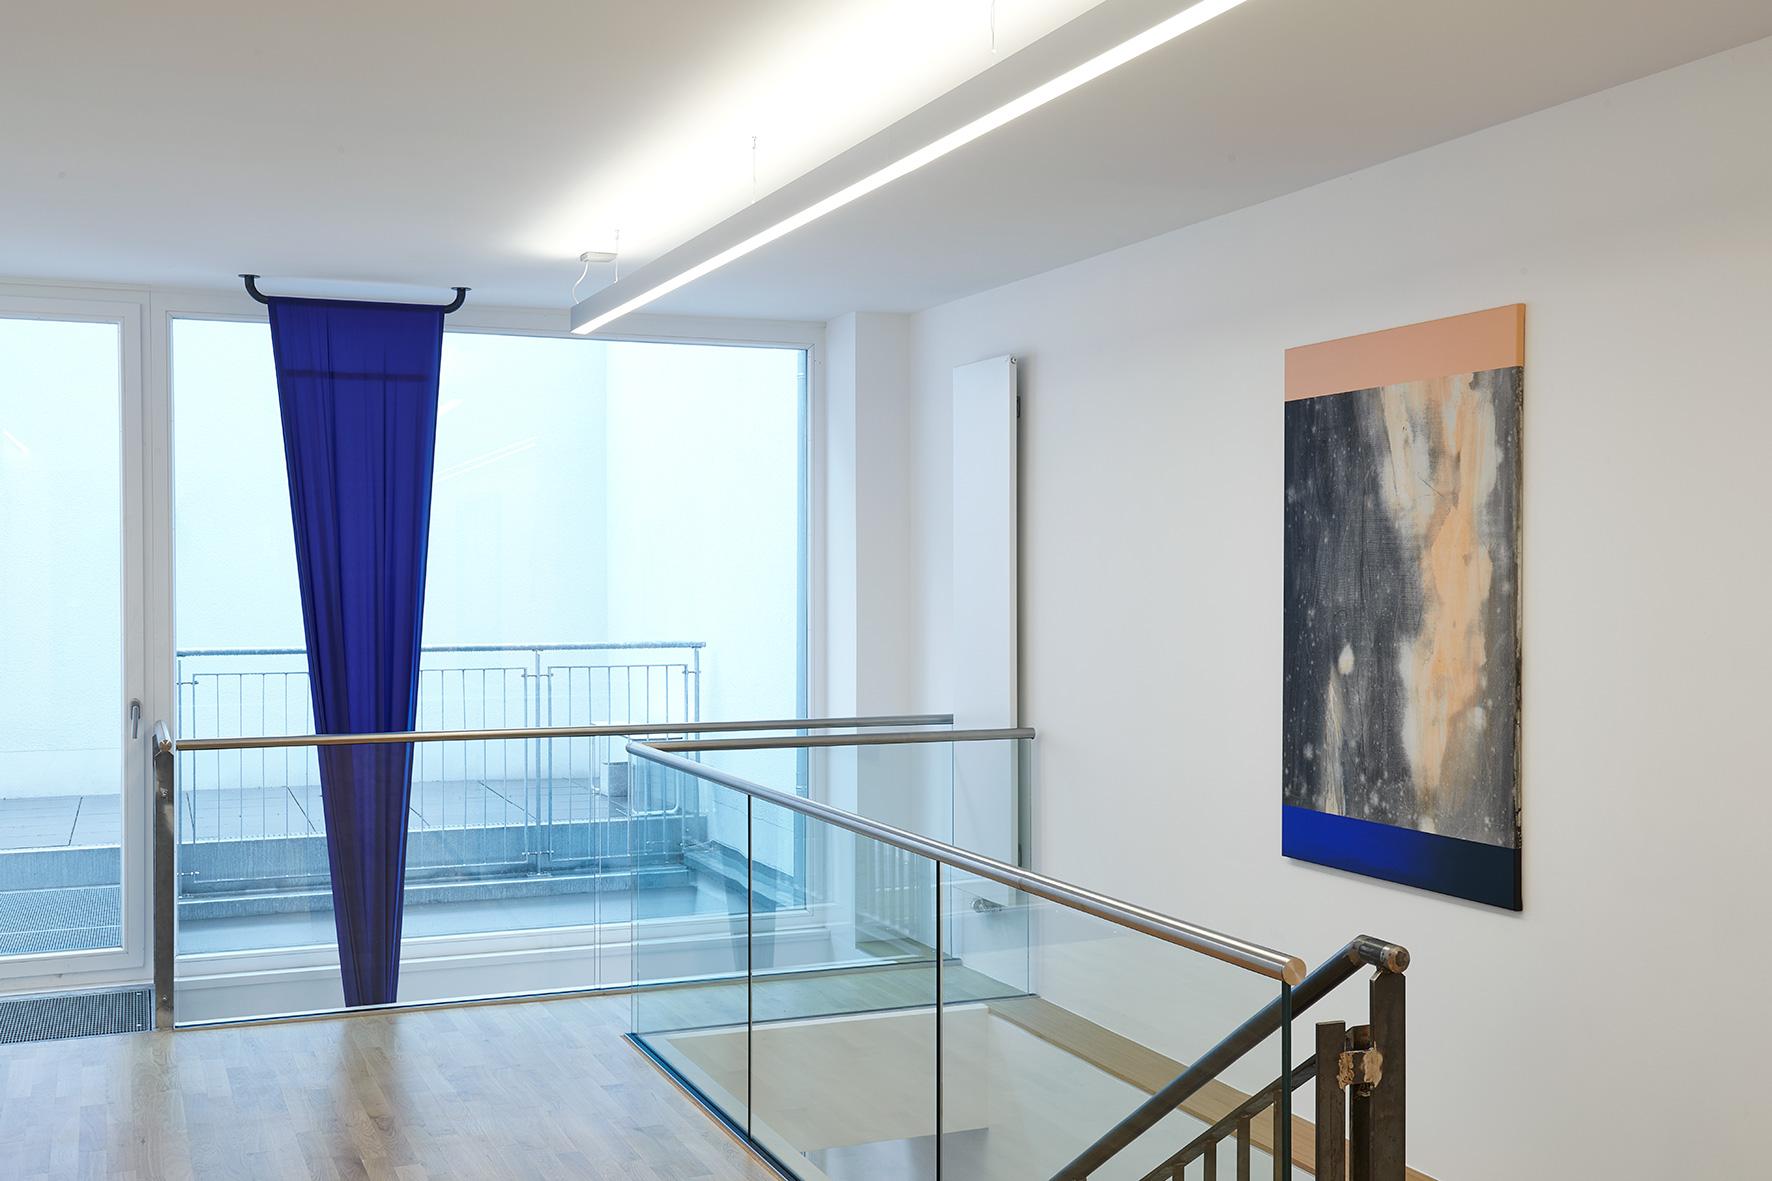 2019.05.08_Galerie-Alber_07.web.jpg